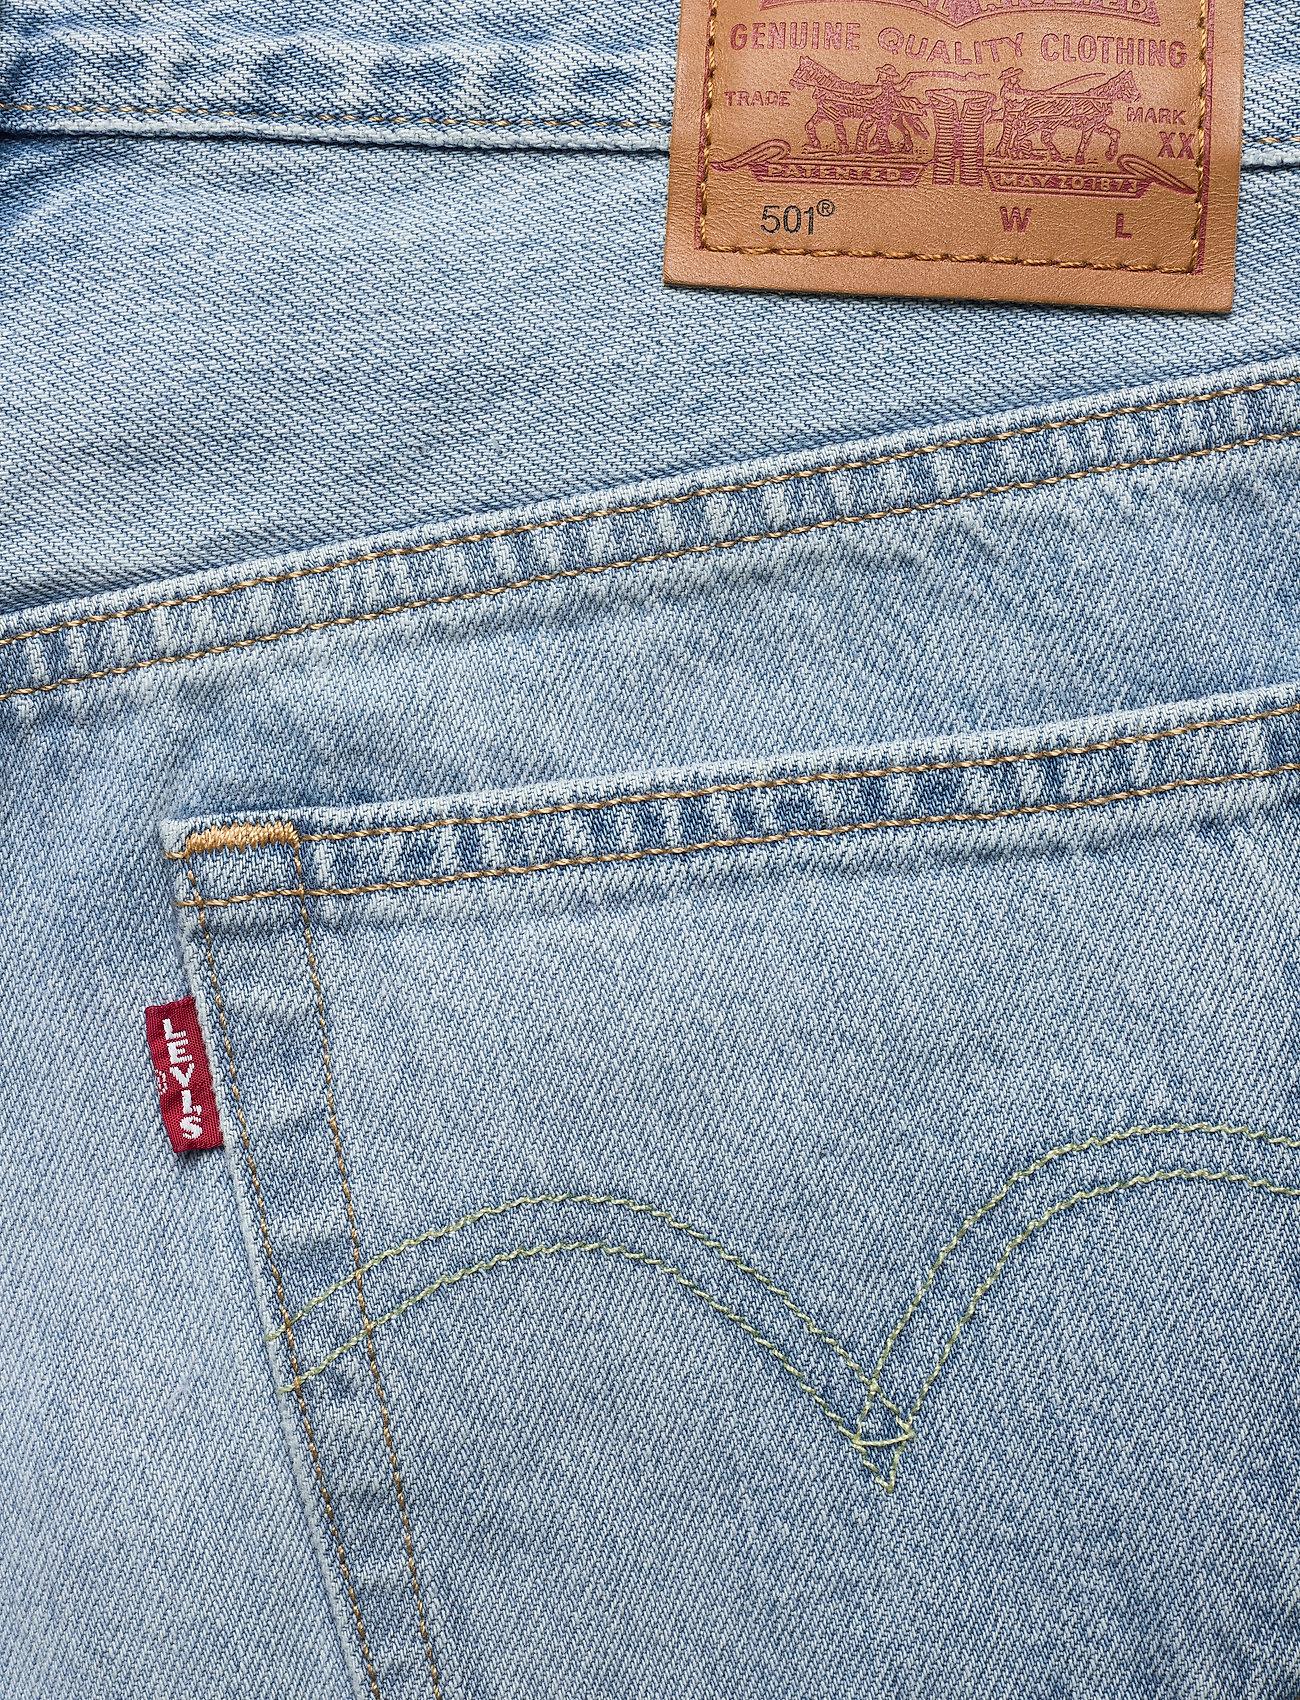 LEVI´S Women - 501 CROP OJAI LUXOR RA - straight regular - light indigo - worn in - 4